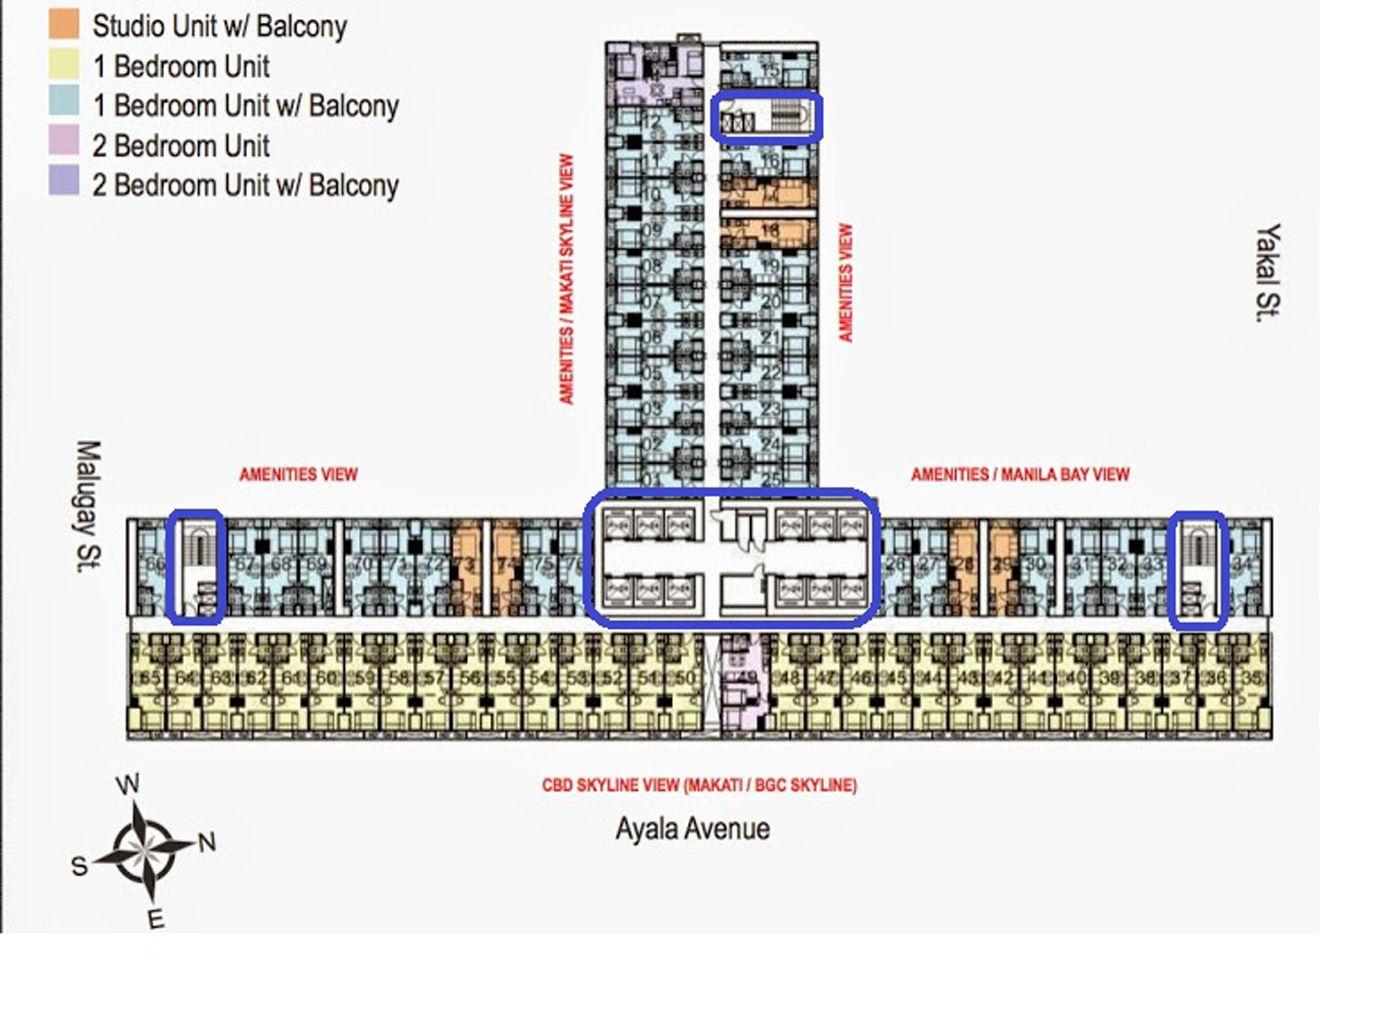 菲律宾房产网 Smdc Air Residences Makati